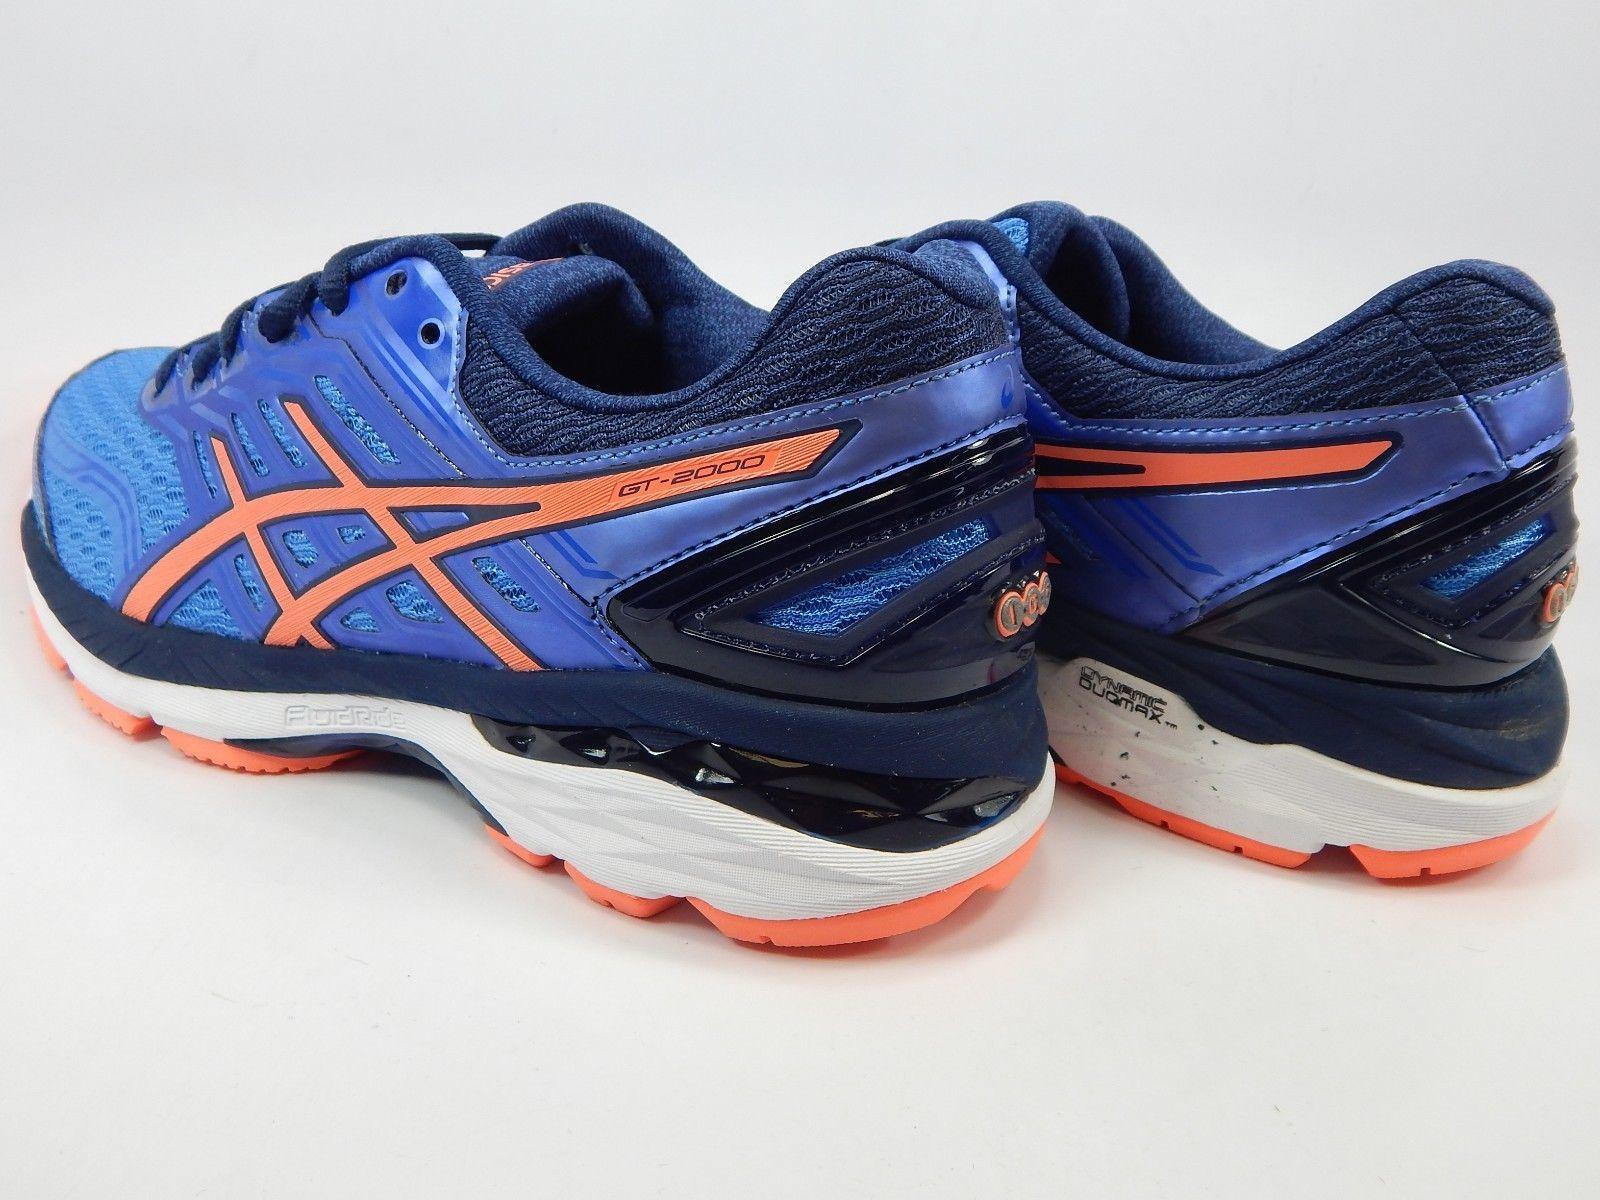 Asics GT 2000 v 5 Size US 7 M (B) EU 38 Women's Running Shoes Blue Pink T757N